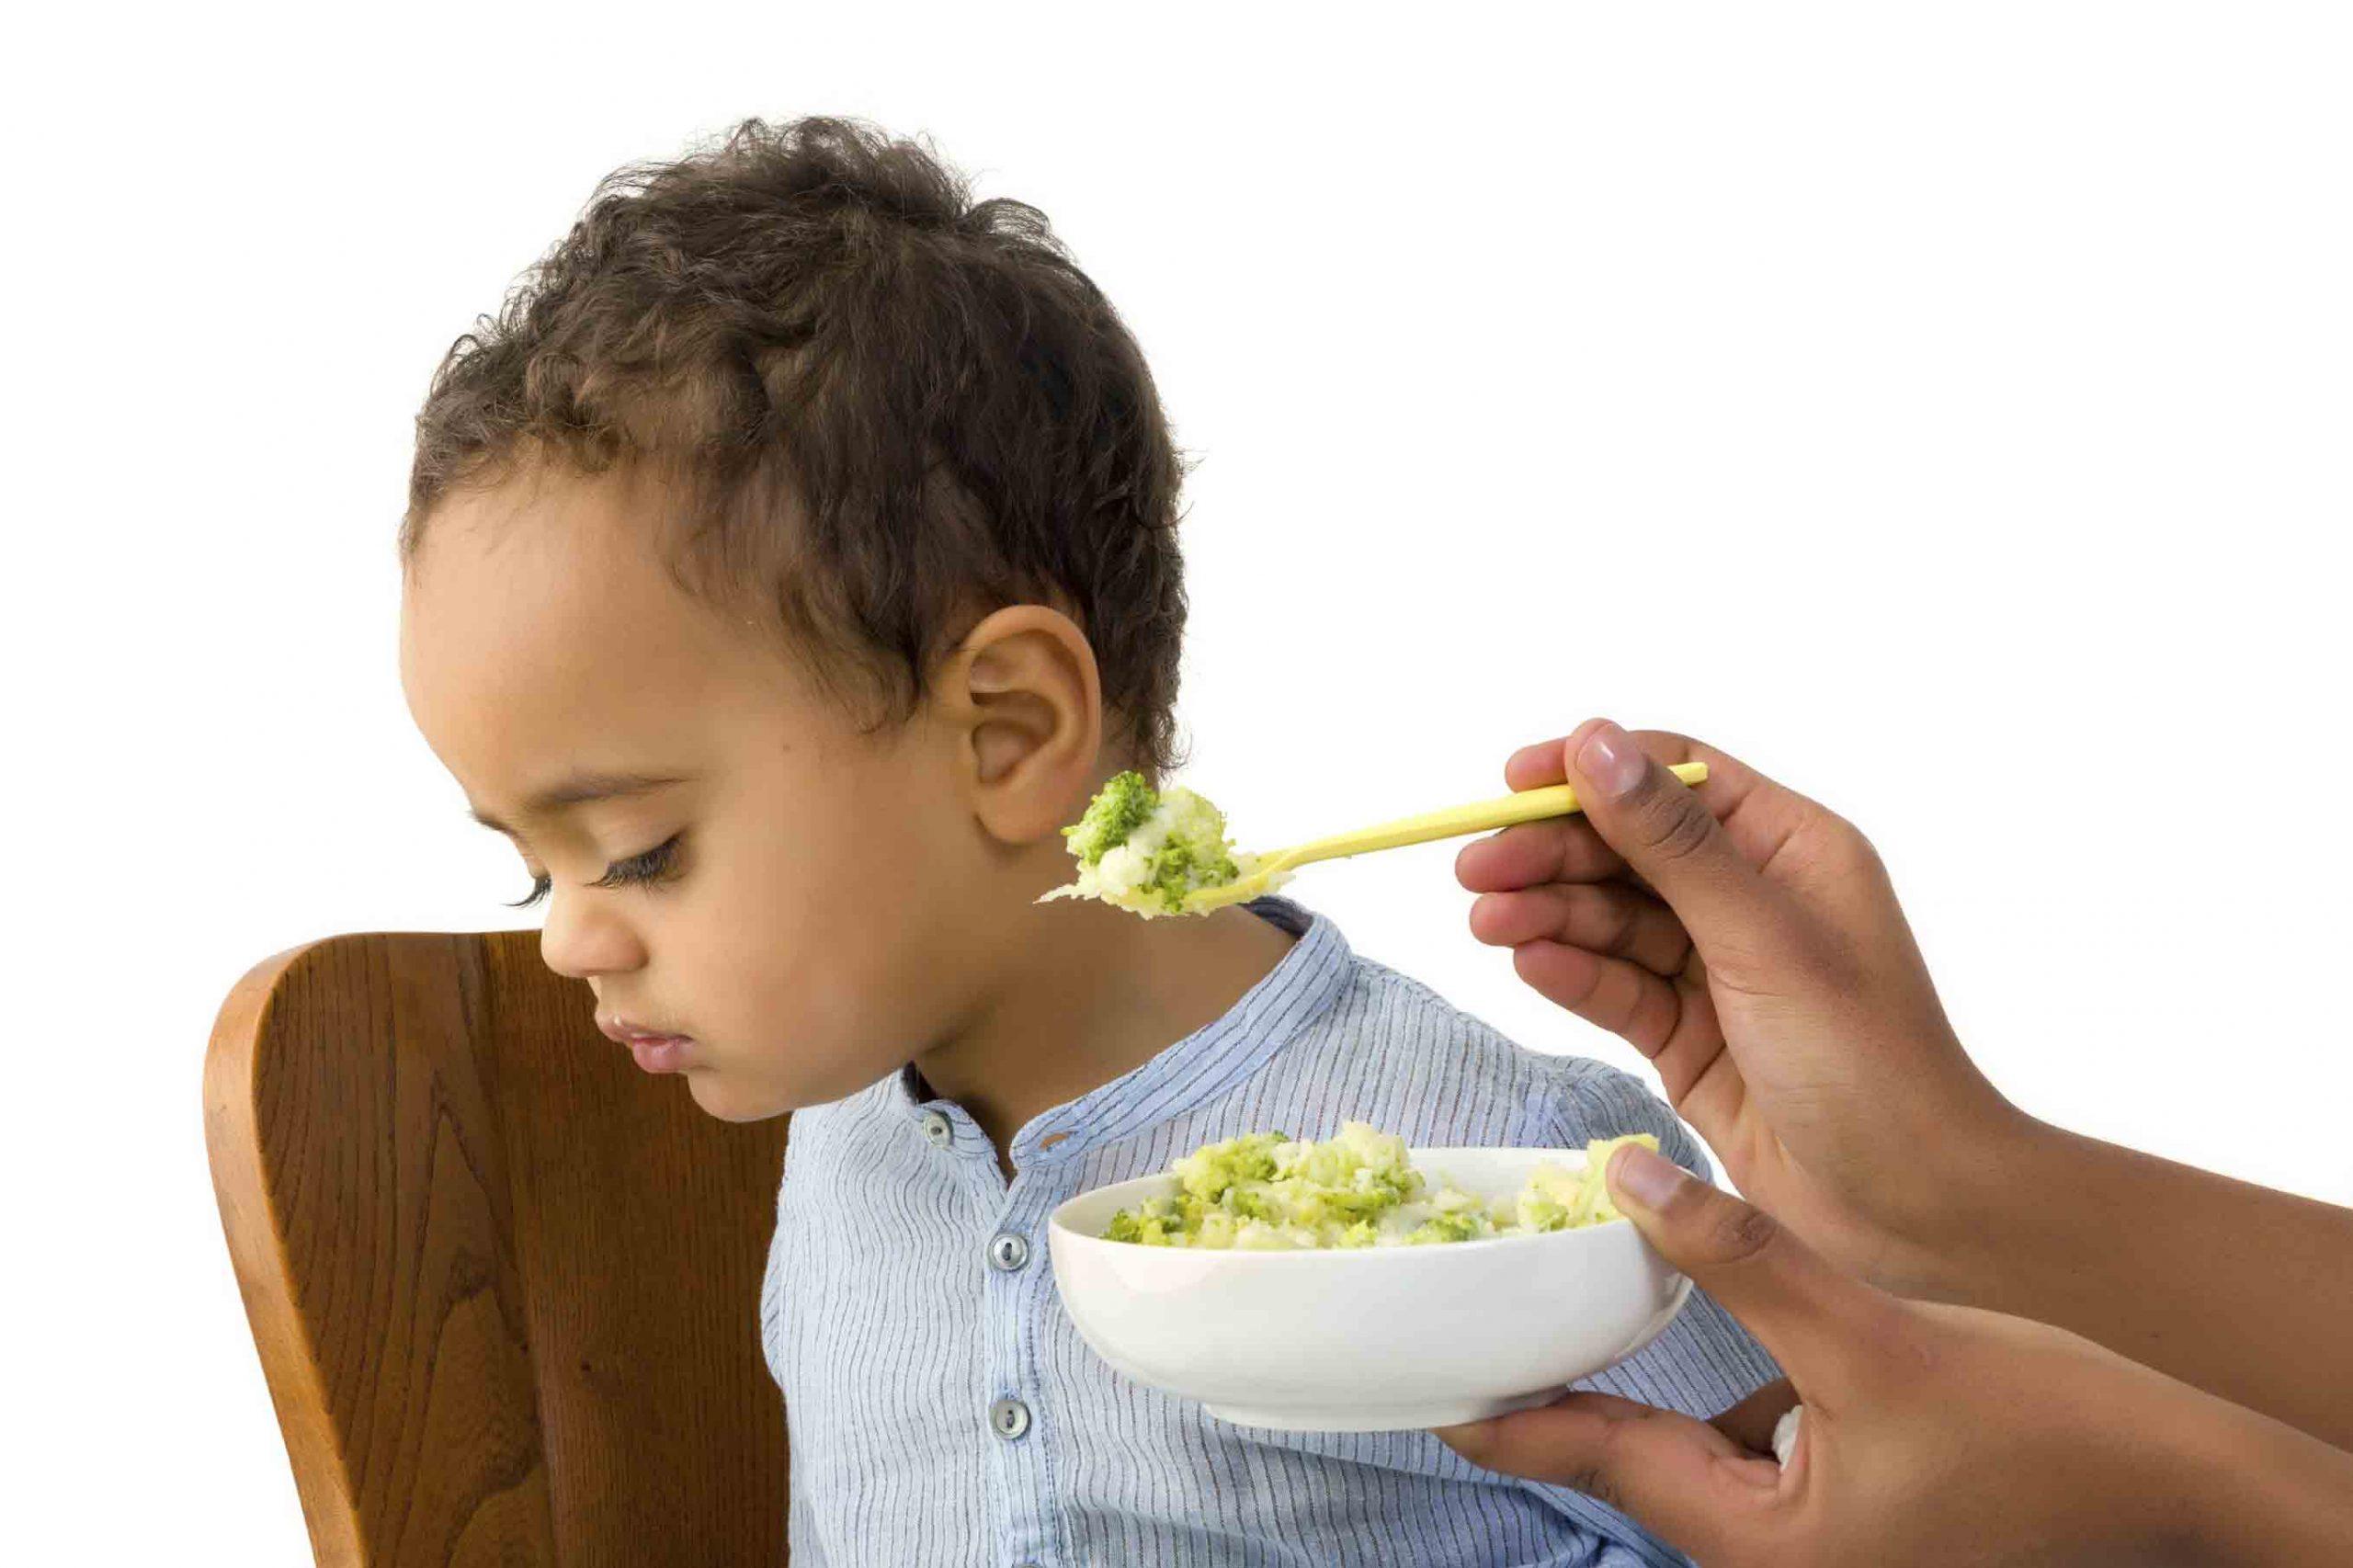 تغذیه کودکان لاغر | مرکز پارسیان مهرپرور